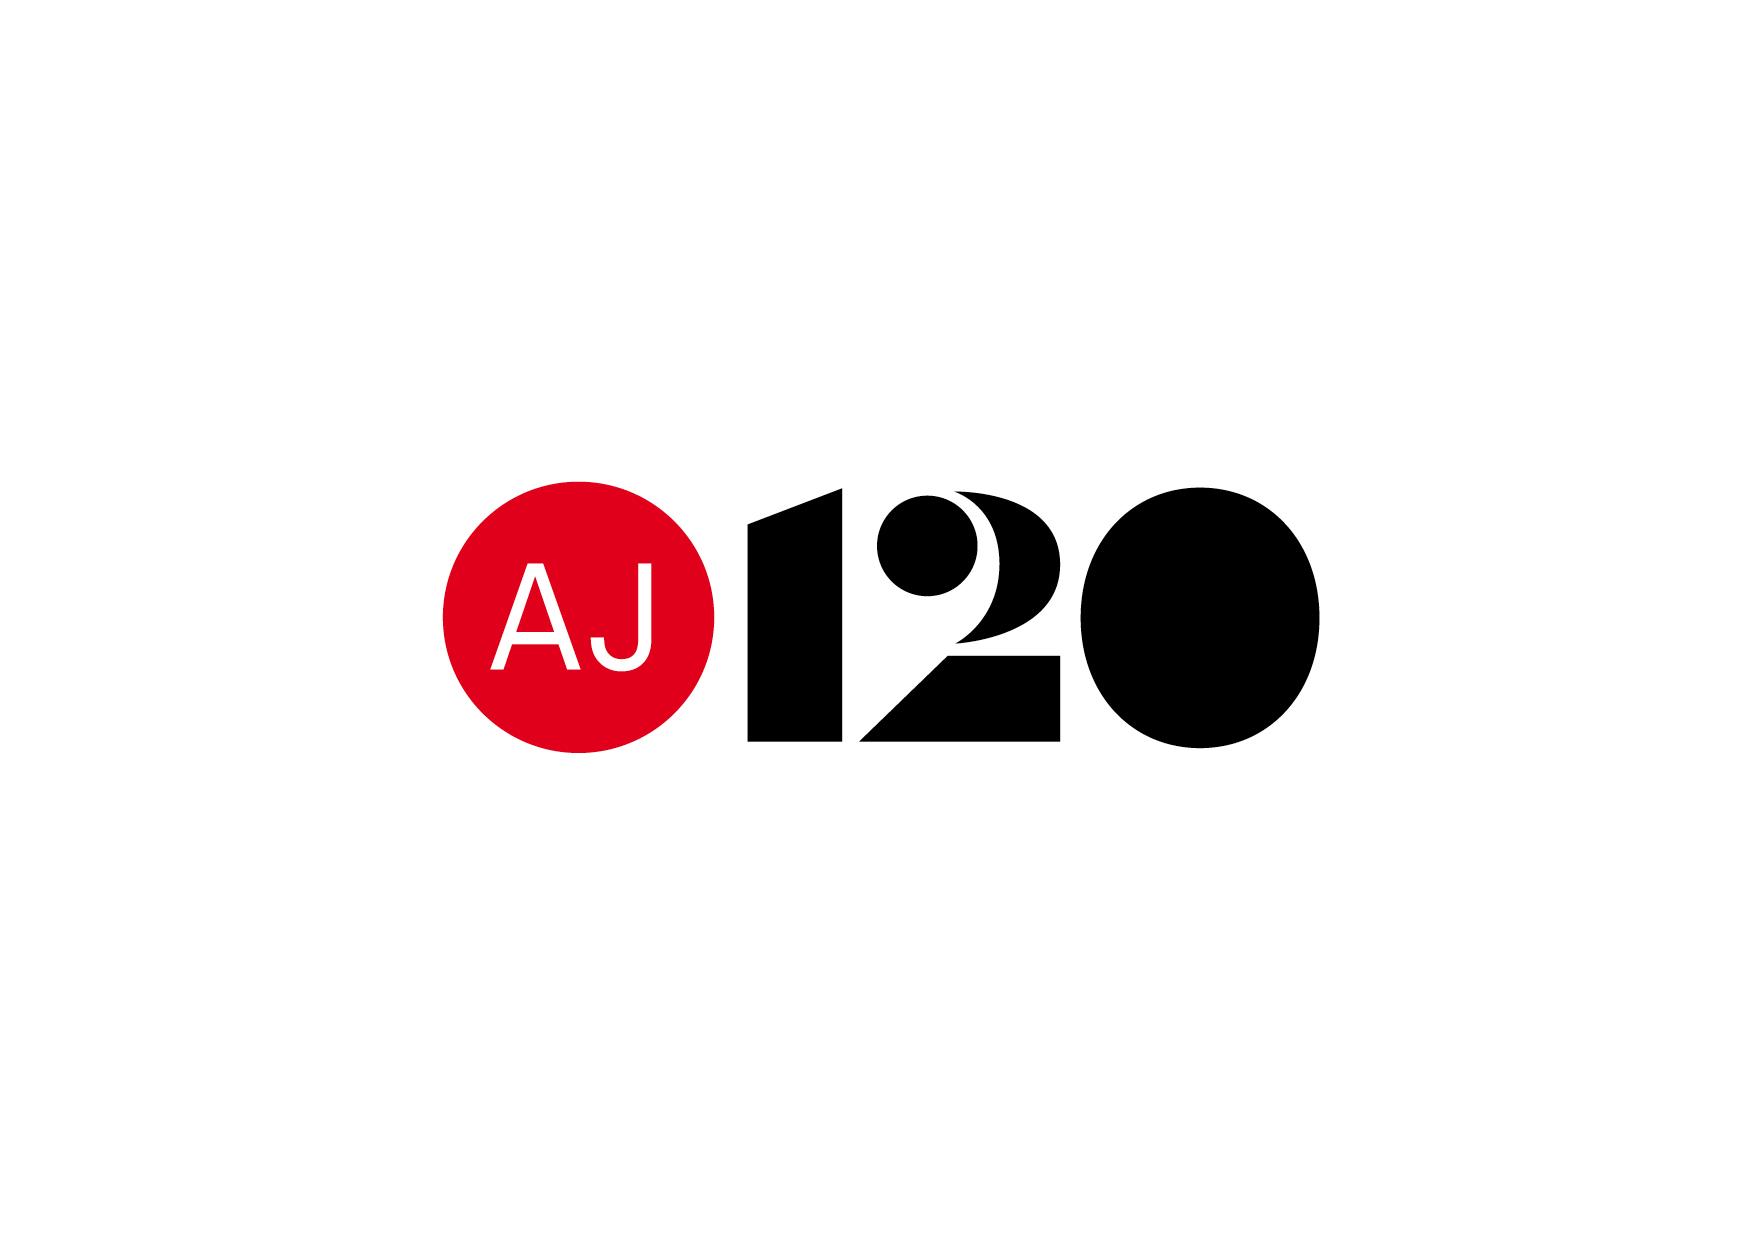 AJ120